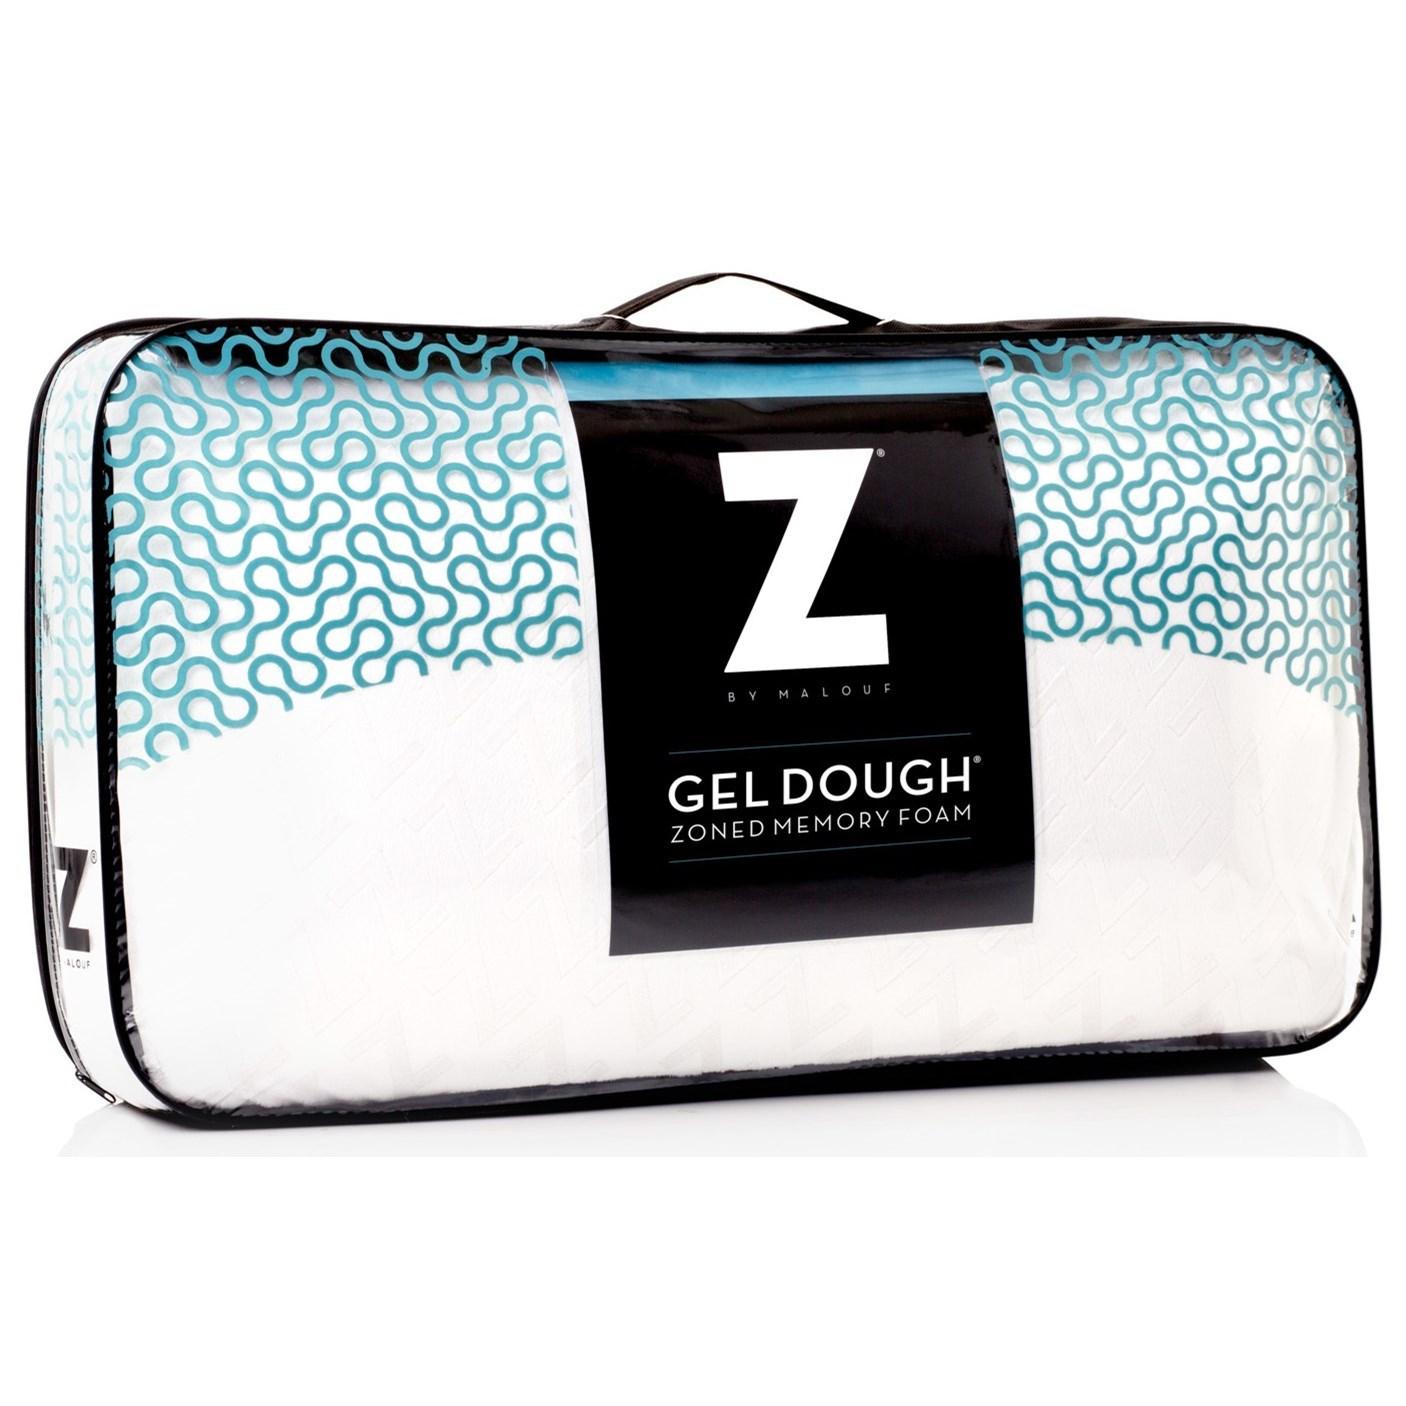 Malouf Zoned Gel Dough Queen Zoned Gel Dough High Loft Pillow - Item Number: ZZQQHPZG